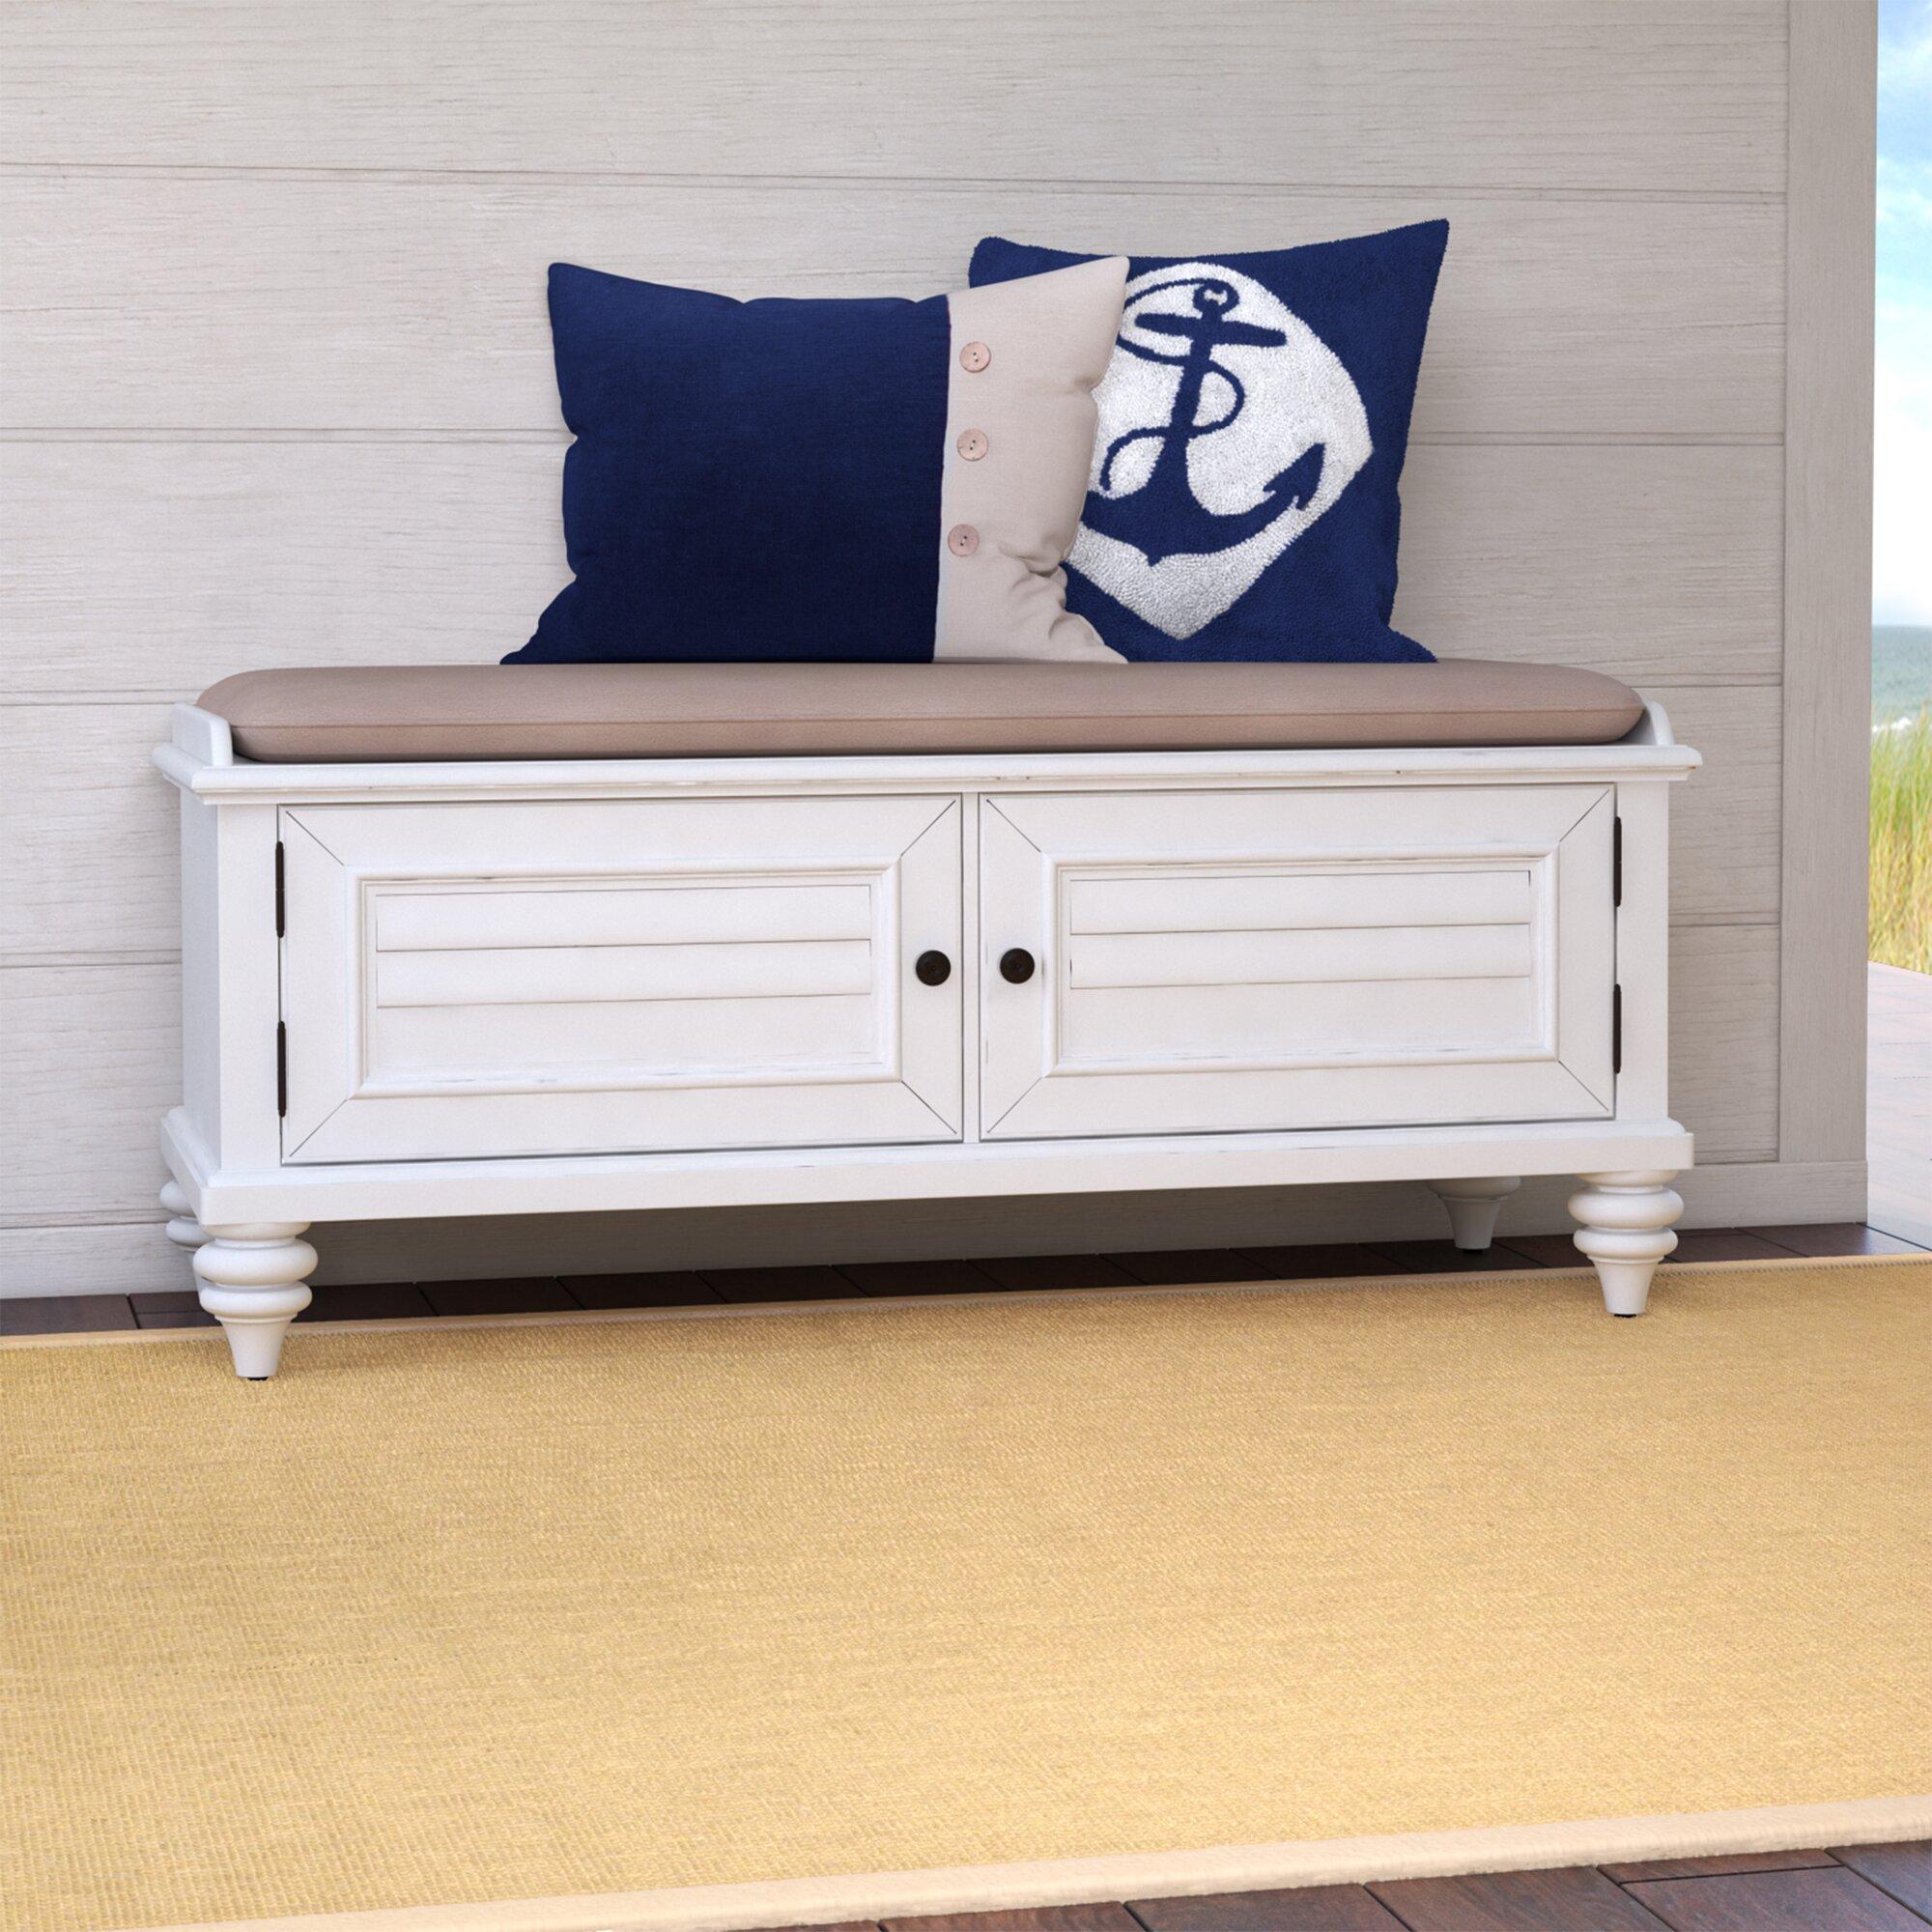 Varian Upholstered Storage Bedroom Bench Birchlane: Kenduskeag Upholstered Storage Entryway Bench & Reviews